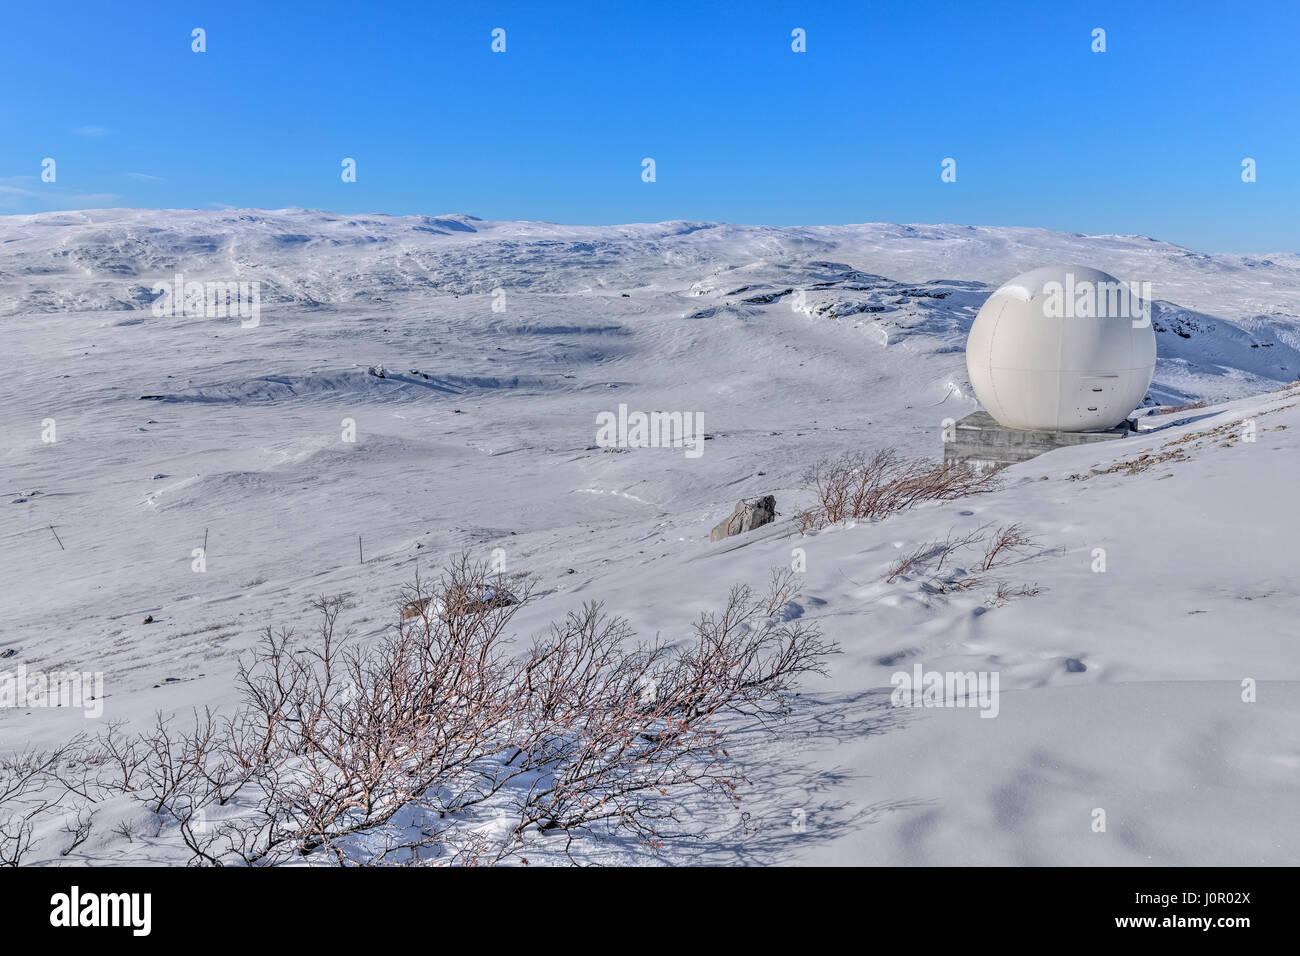 Kangerlussuaq, Artic Circle, Greenland, Europe - Stock Image